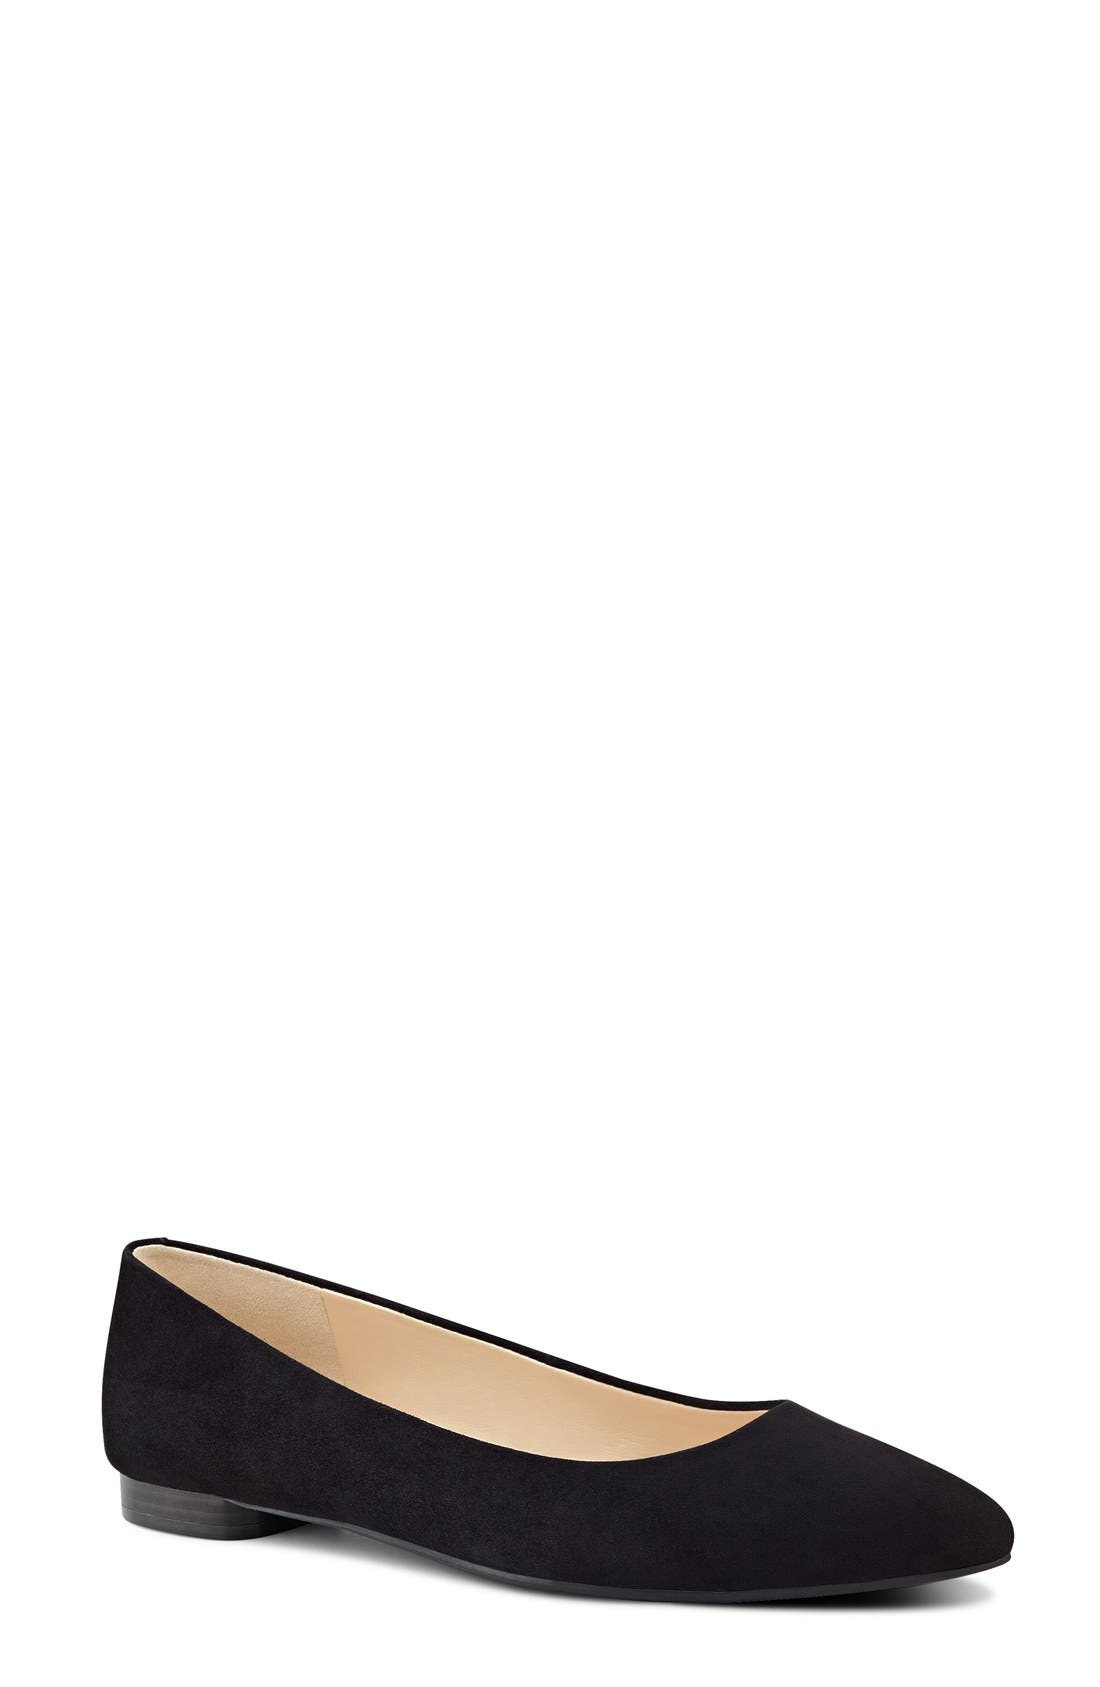 Alternate Image 1 Selected - Nine West 'Onlee' Pointy Toe Flat (Women)